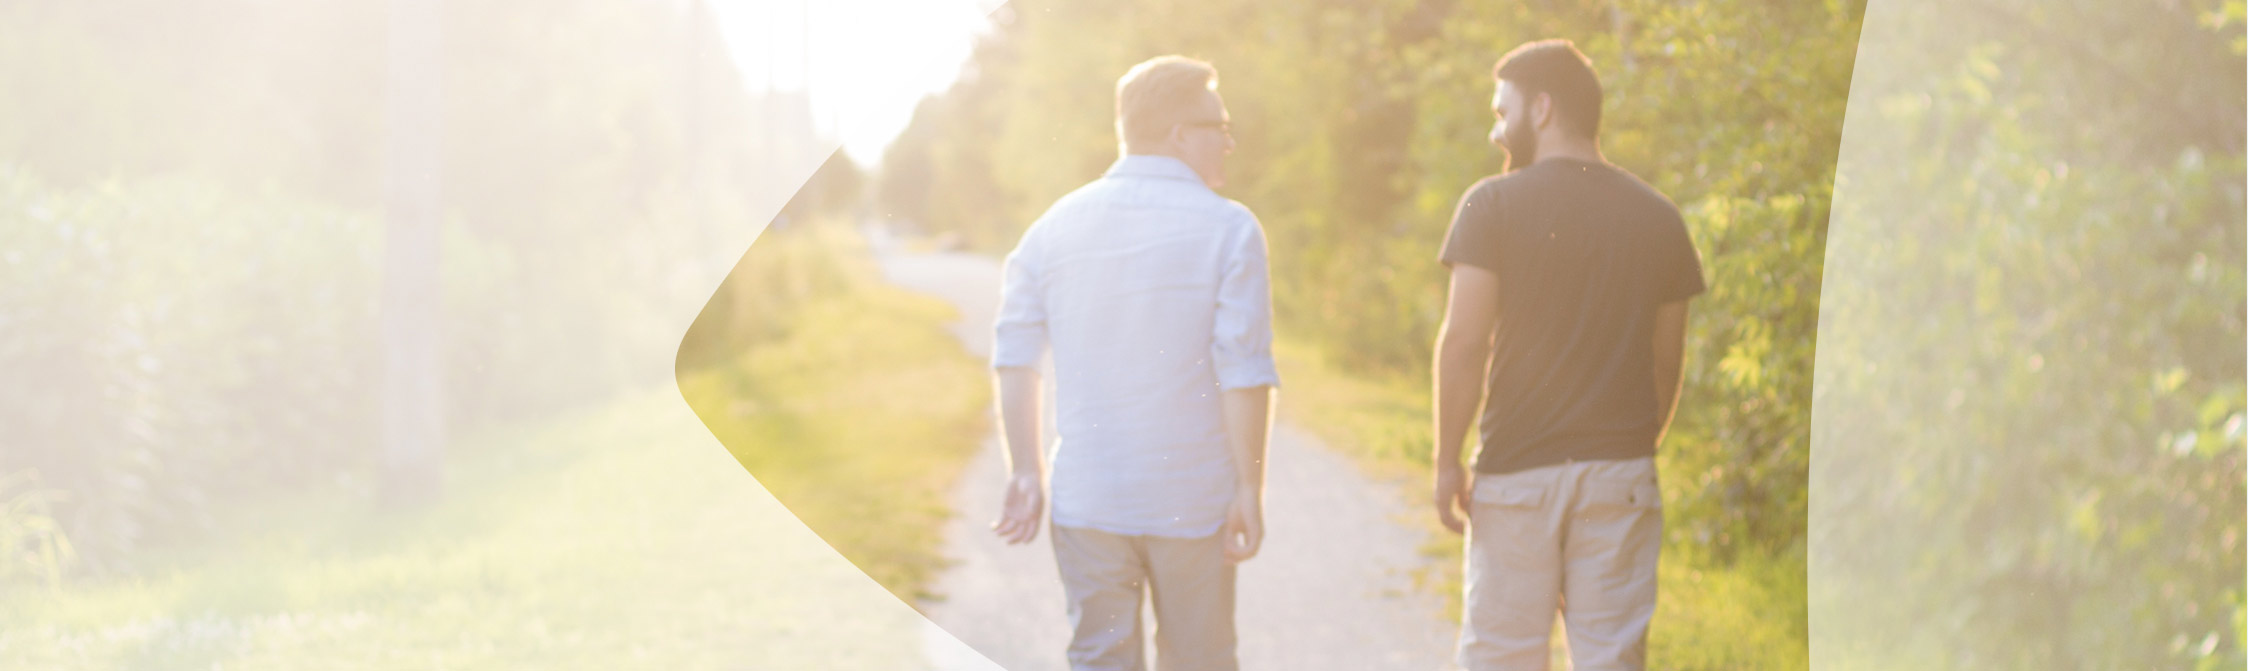 2 Guys walking in park